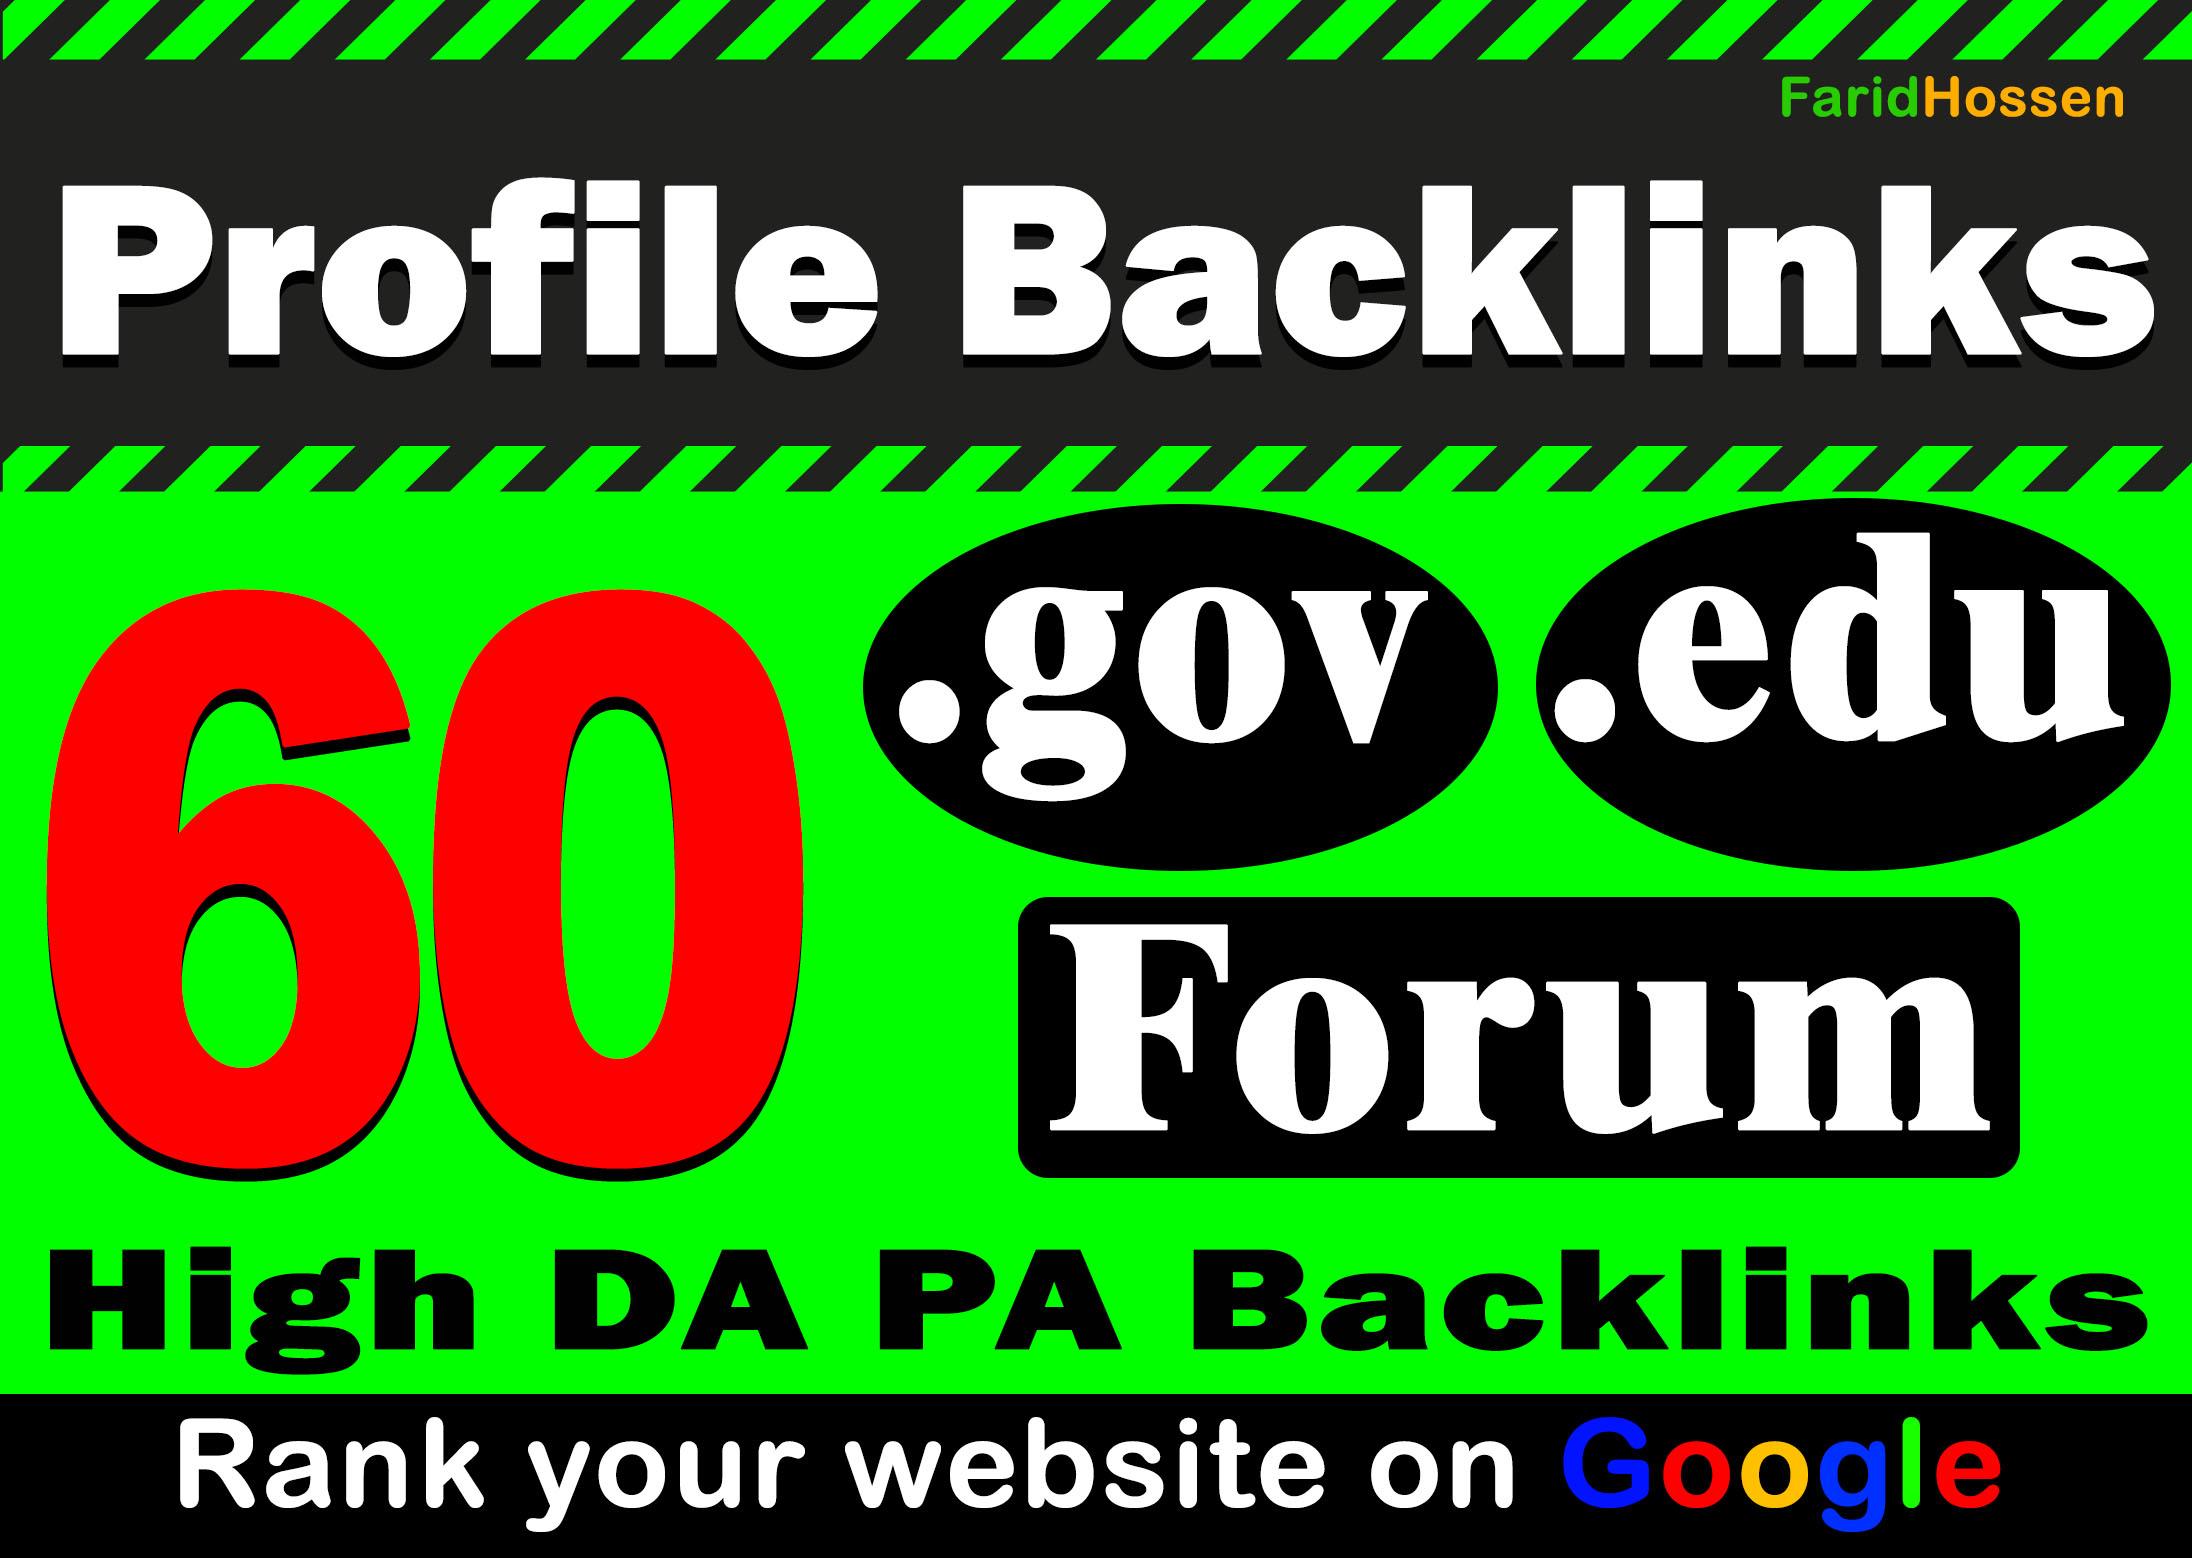 Unique 60. Edu. Gov Forum Profile Backlinks Most Effective Dofollow Backlink